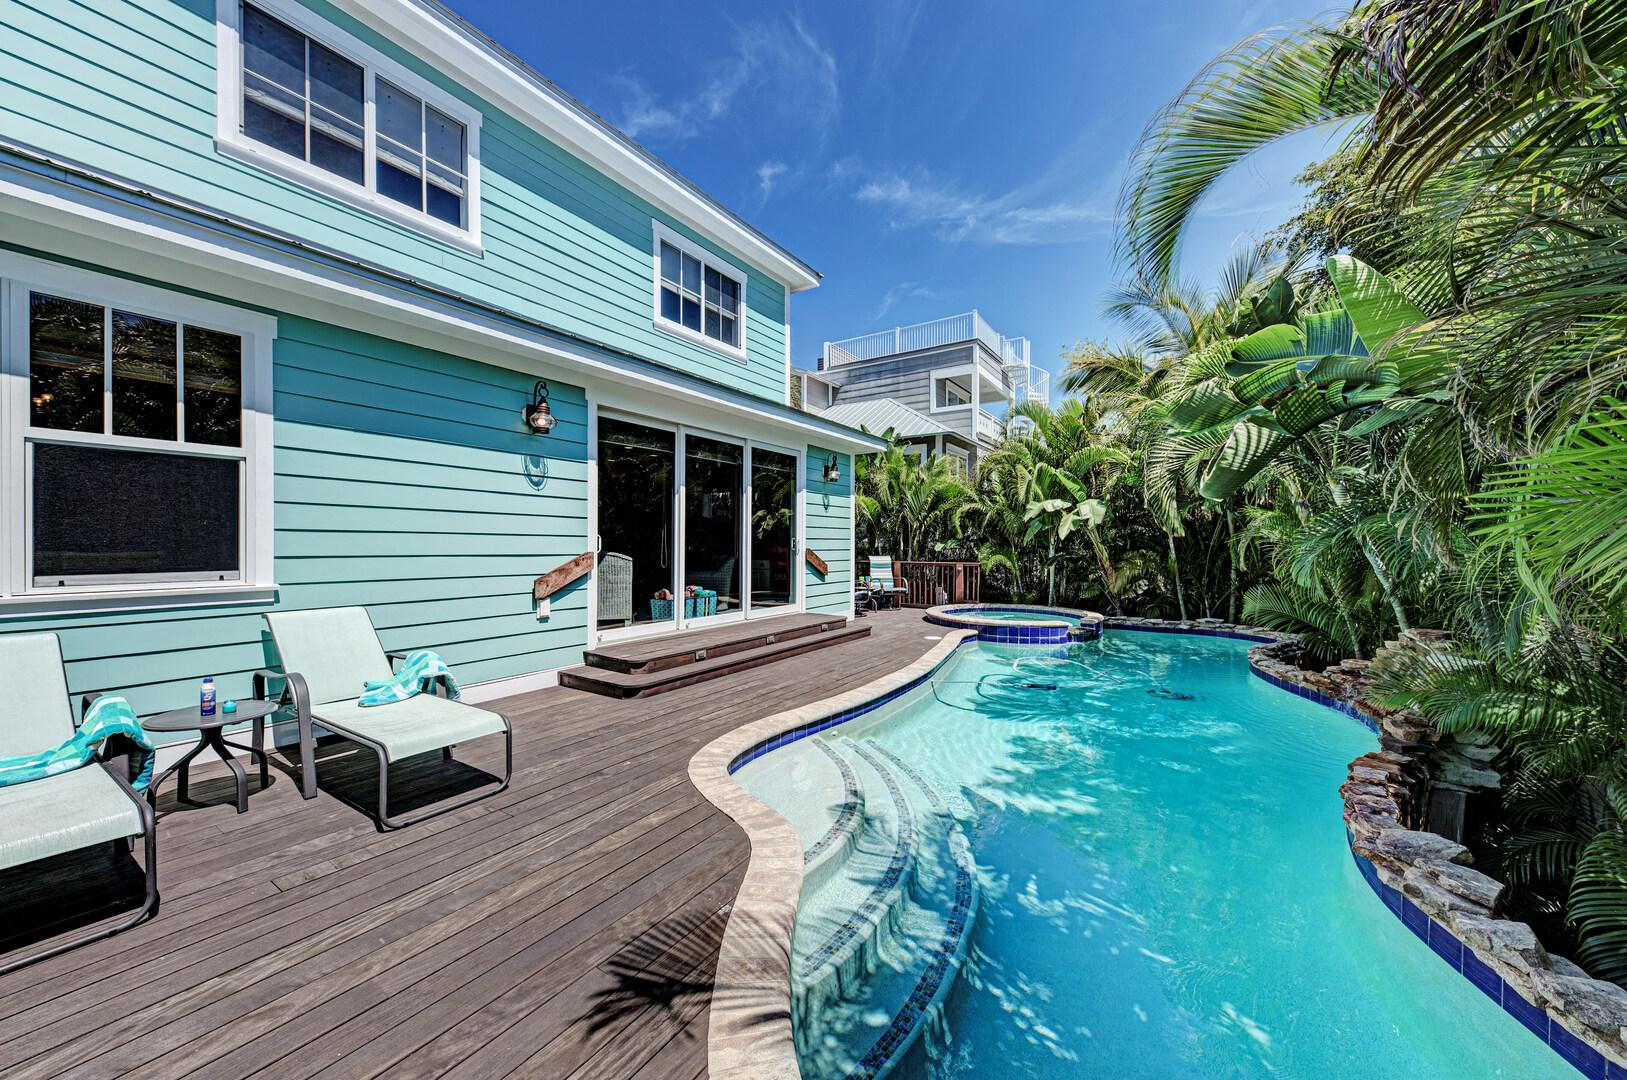 Blue Palm Paradise pool deck alternate view